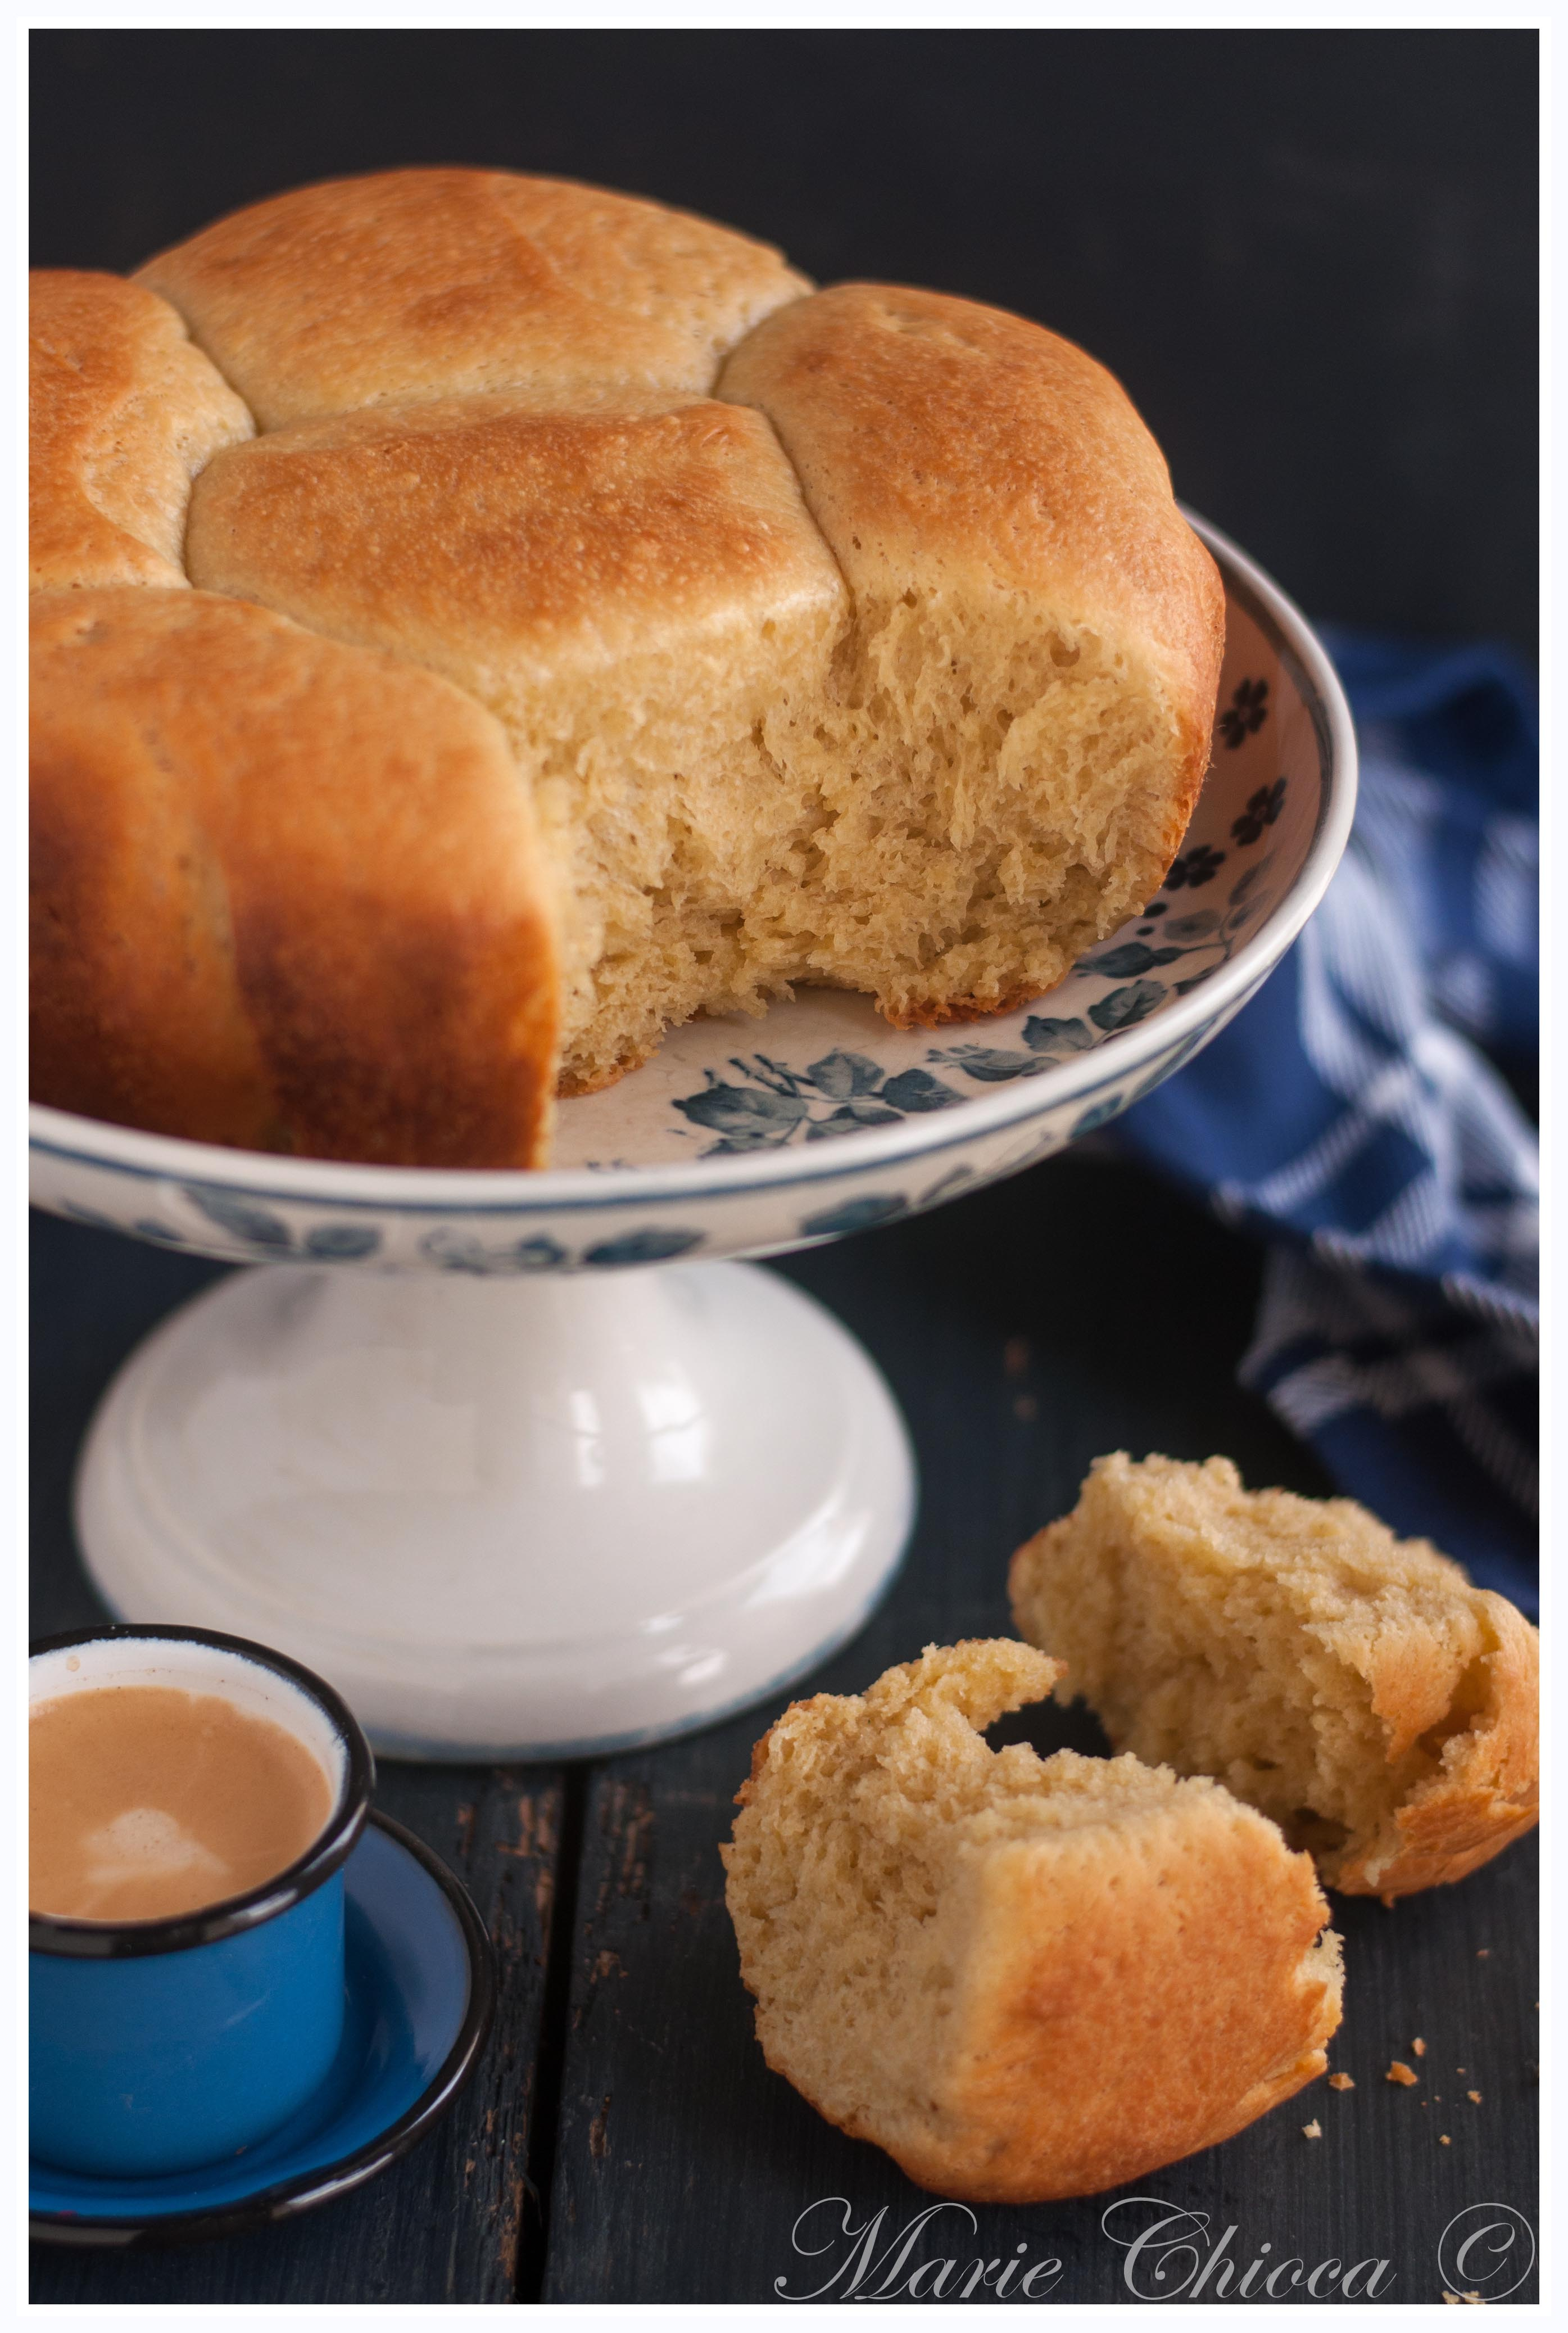 24-brioche-pur-beurre-au-levain-2